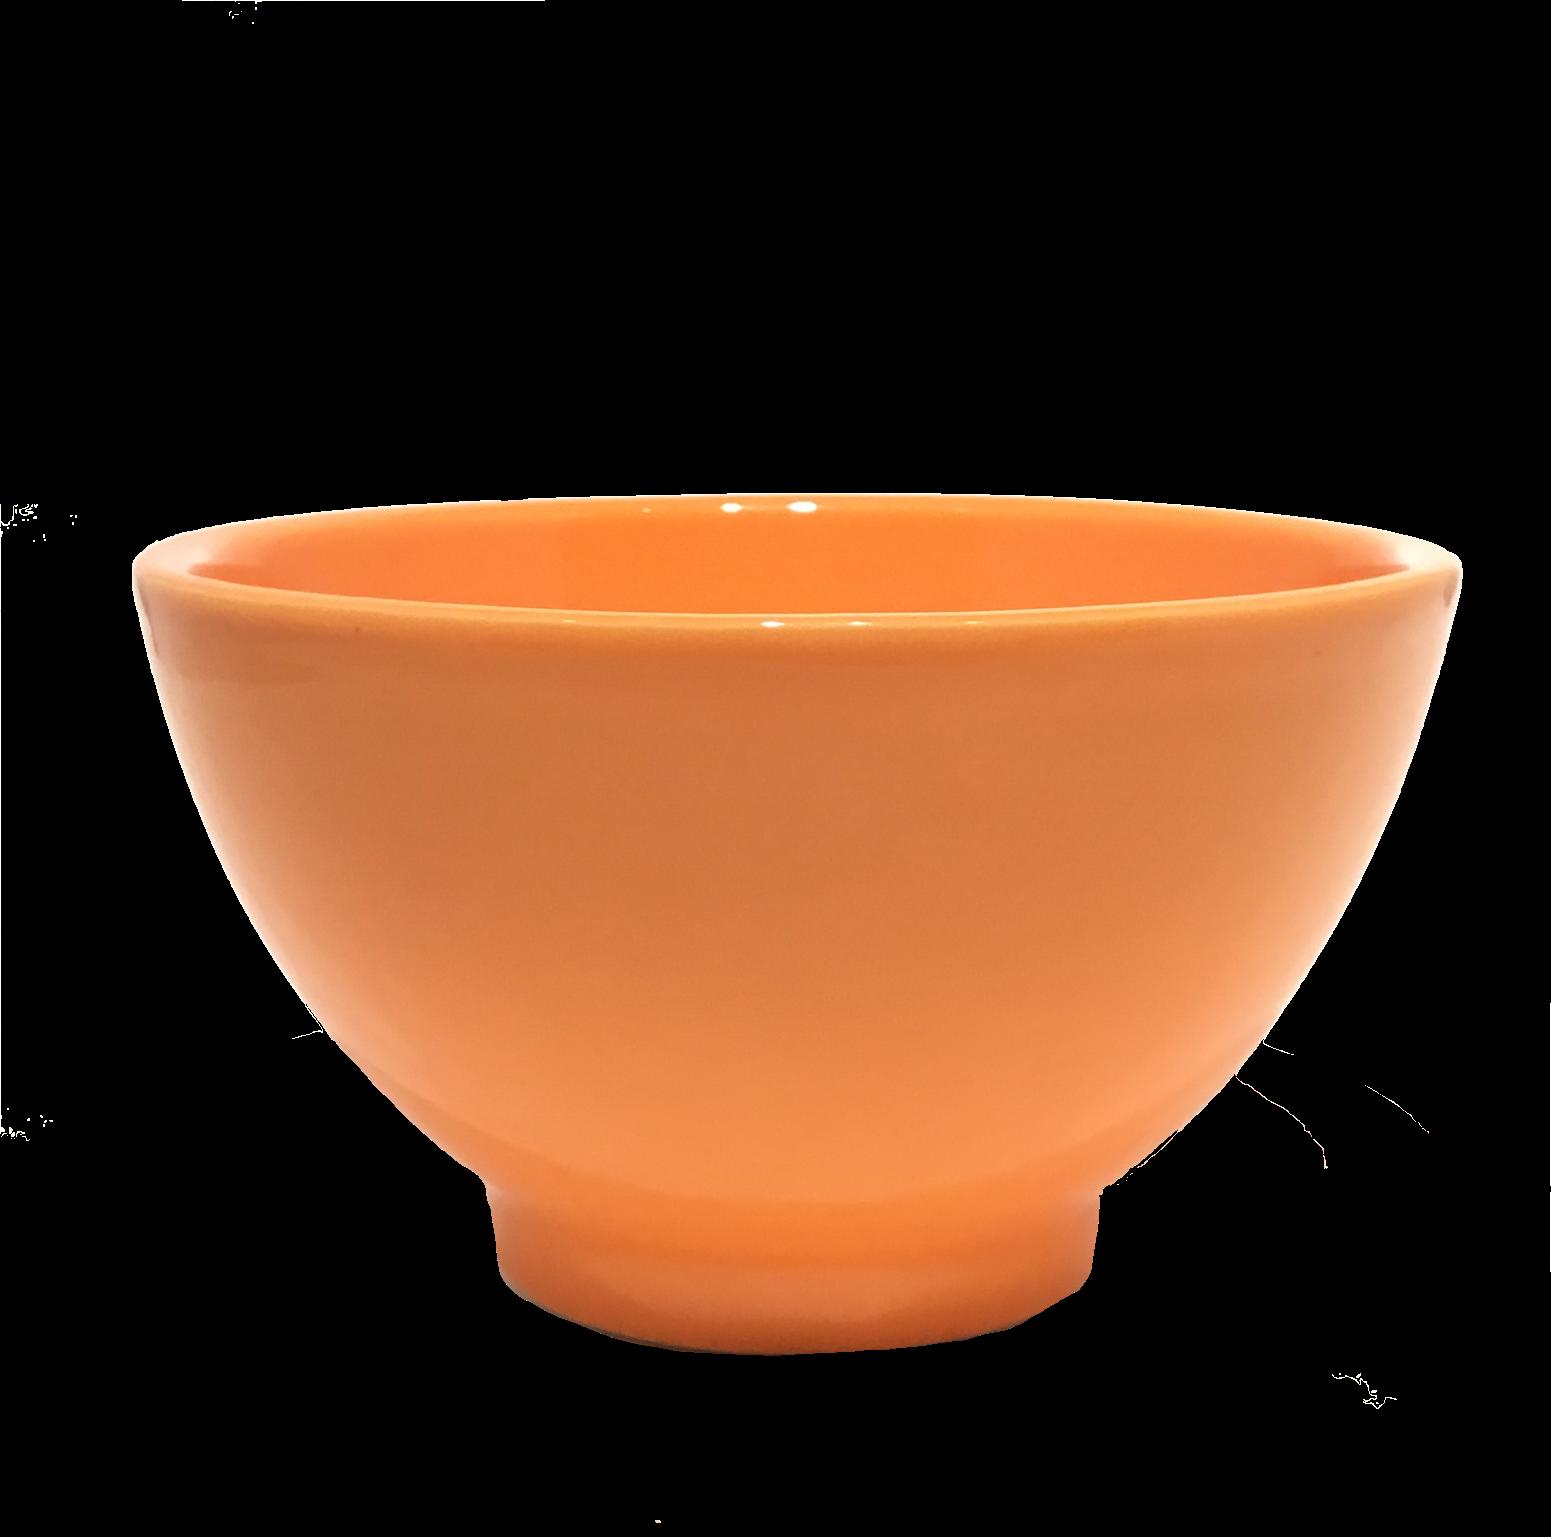 Bowl Coupe-3